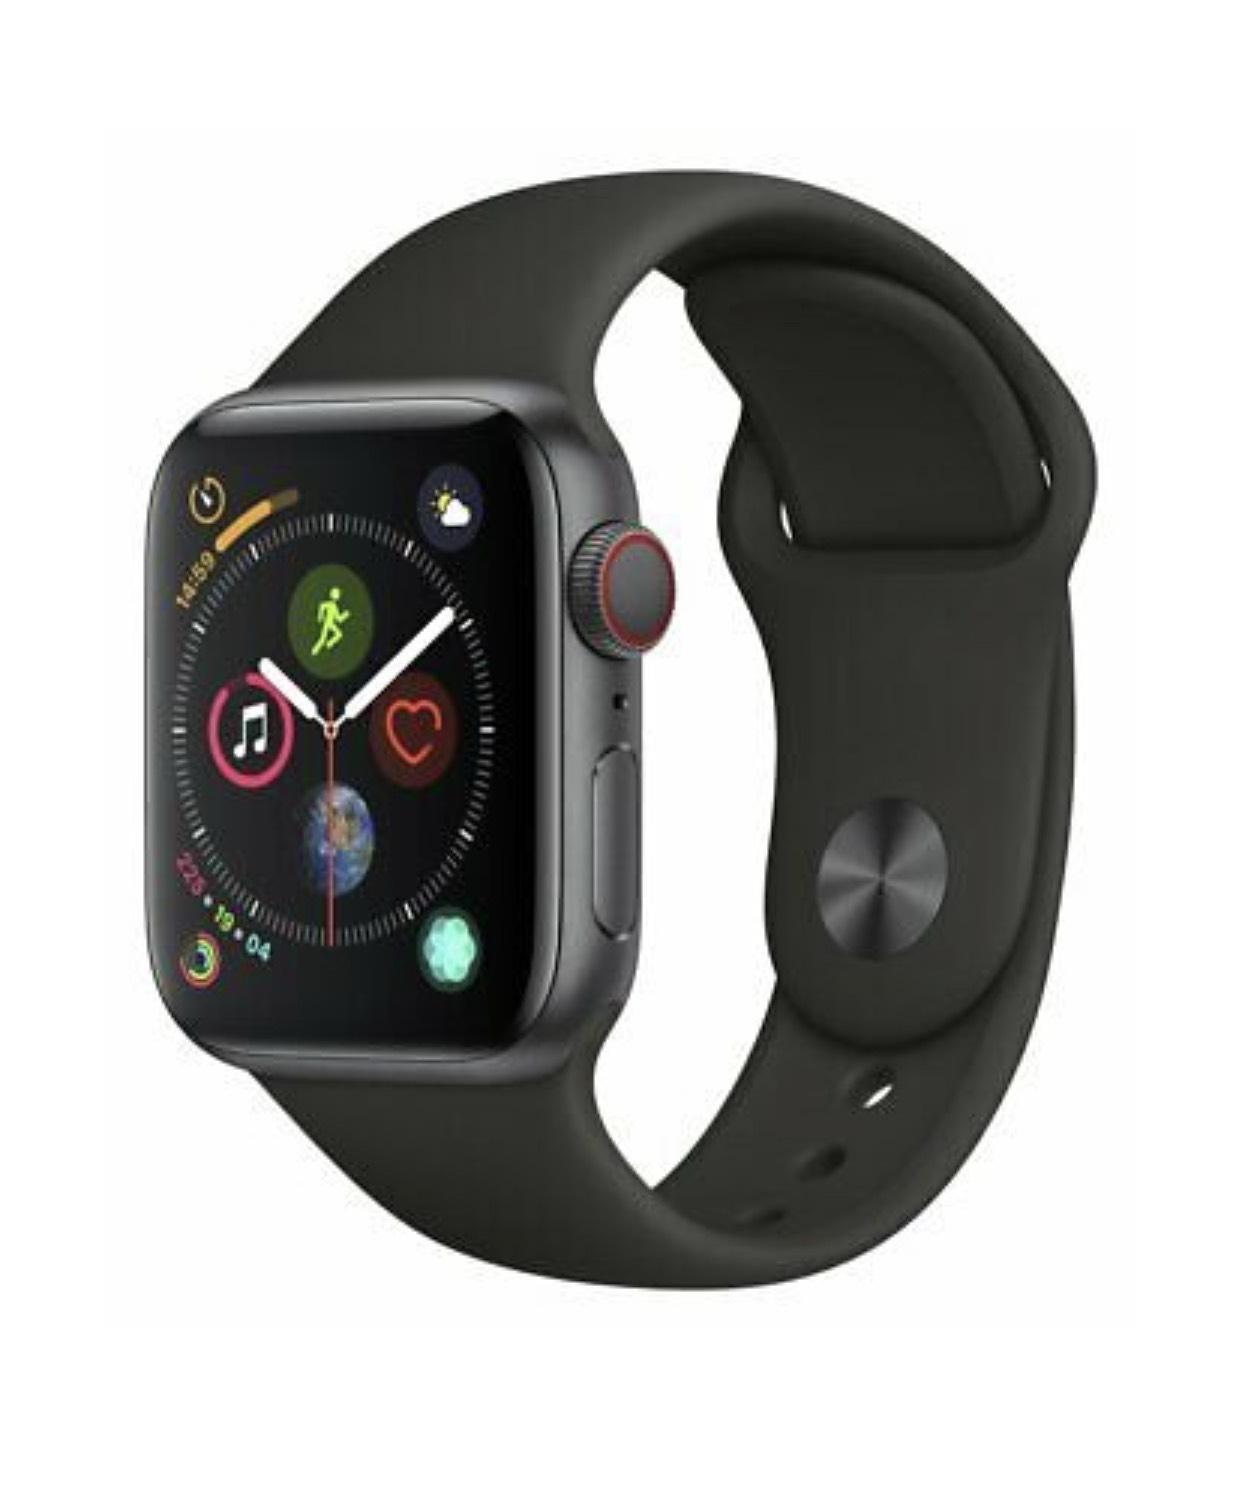 Apple Watch Series 4 Cellular + GPS - Space Grey - Refurbished - £346.99 @ eBay Argos